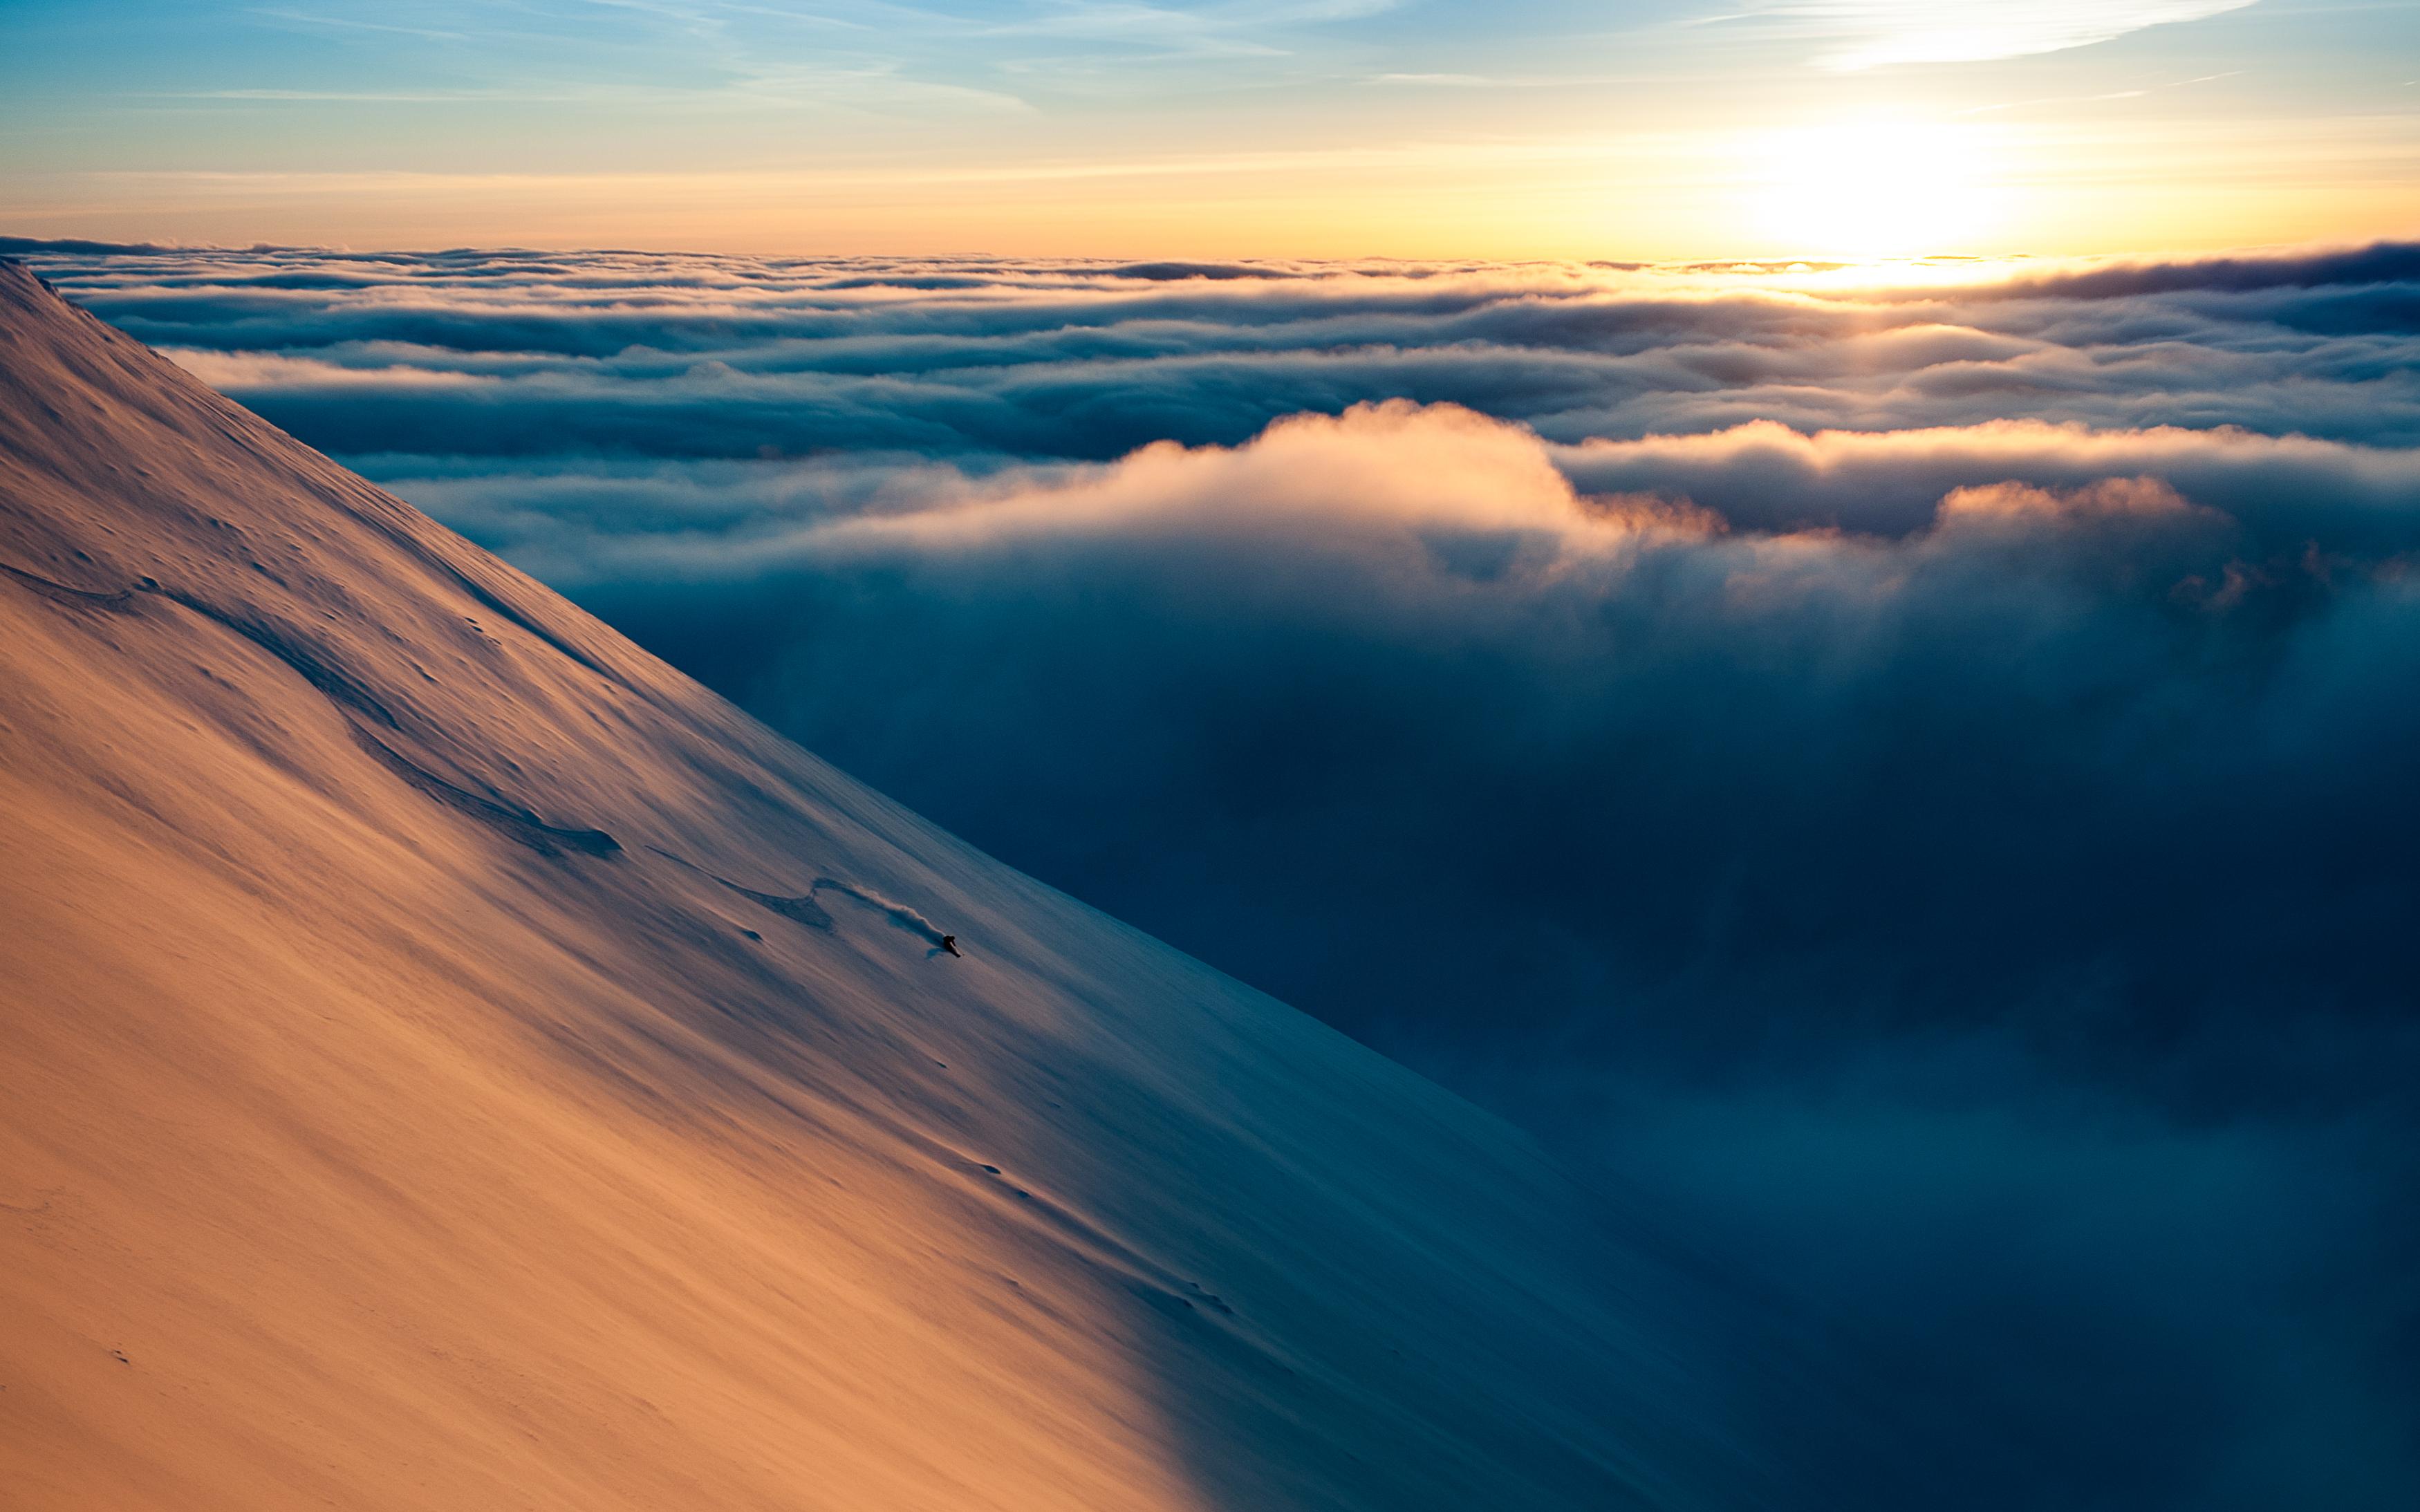 Ski 1 million ascend meters in 10 years.